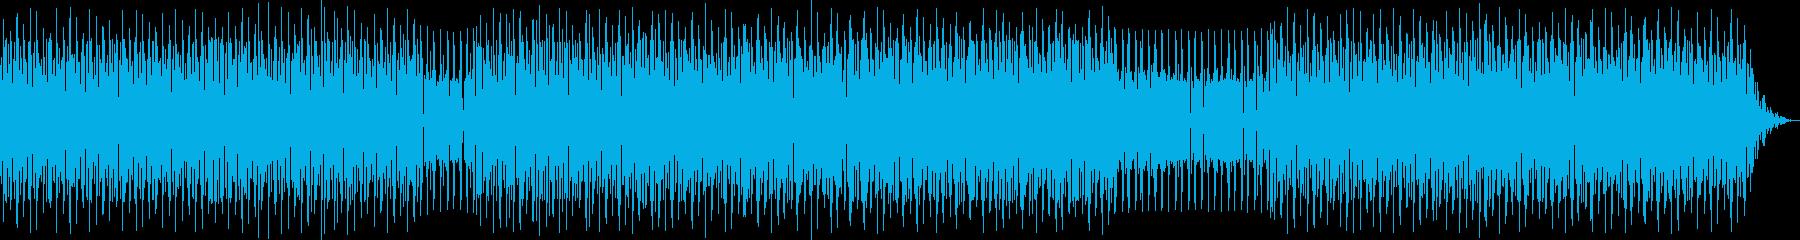 houseの再生済みの波形